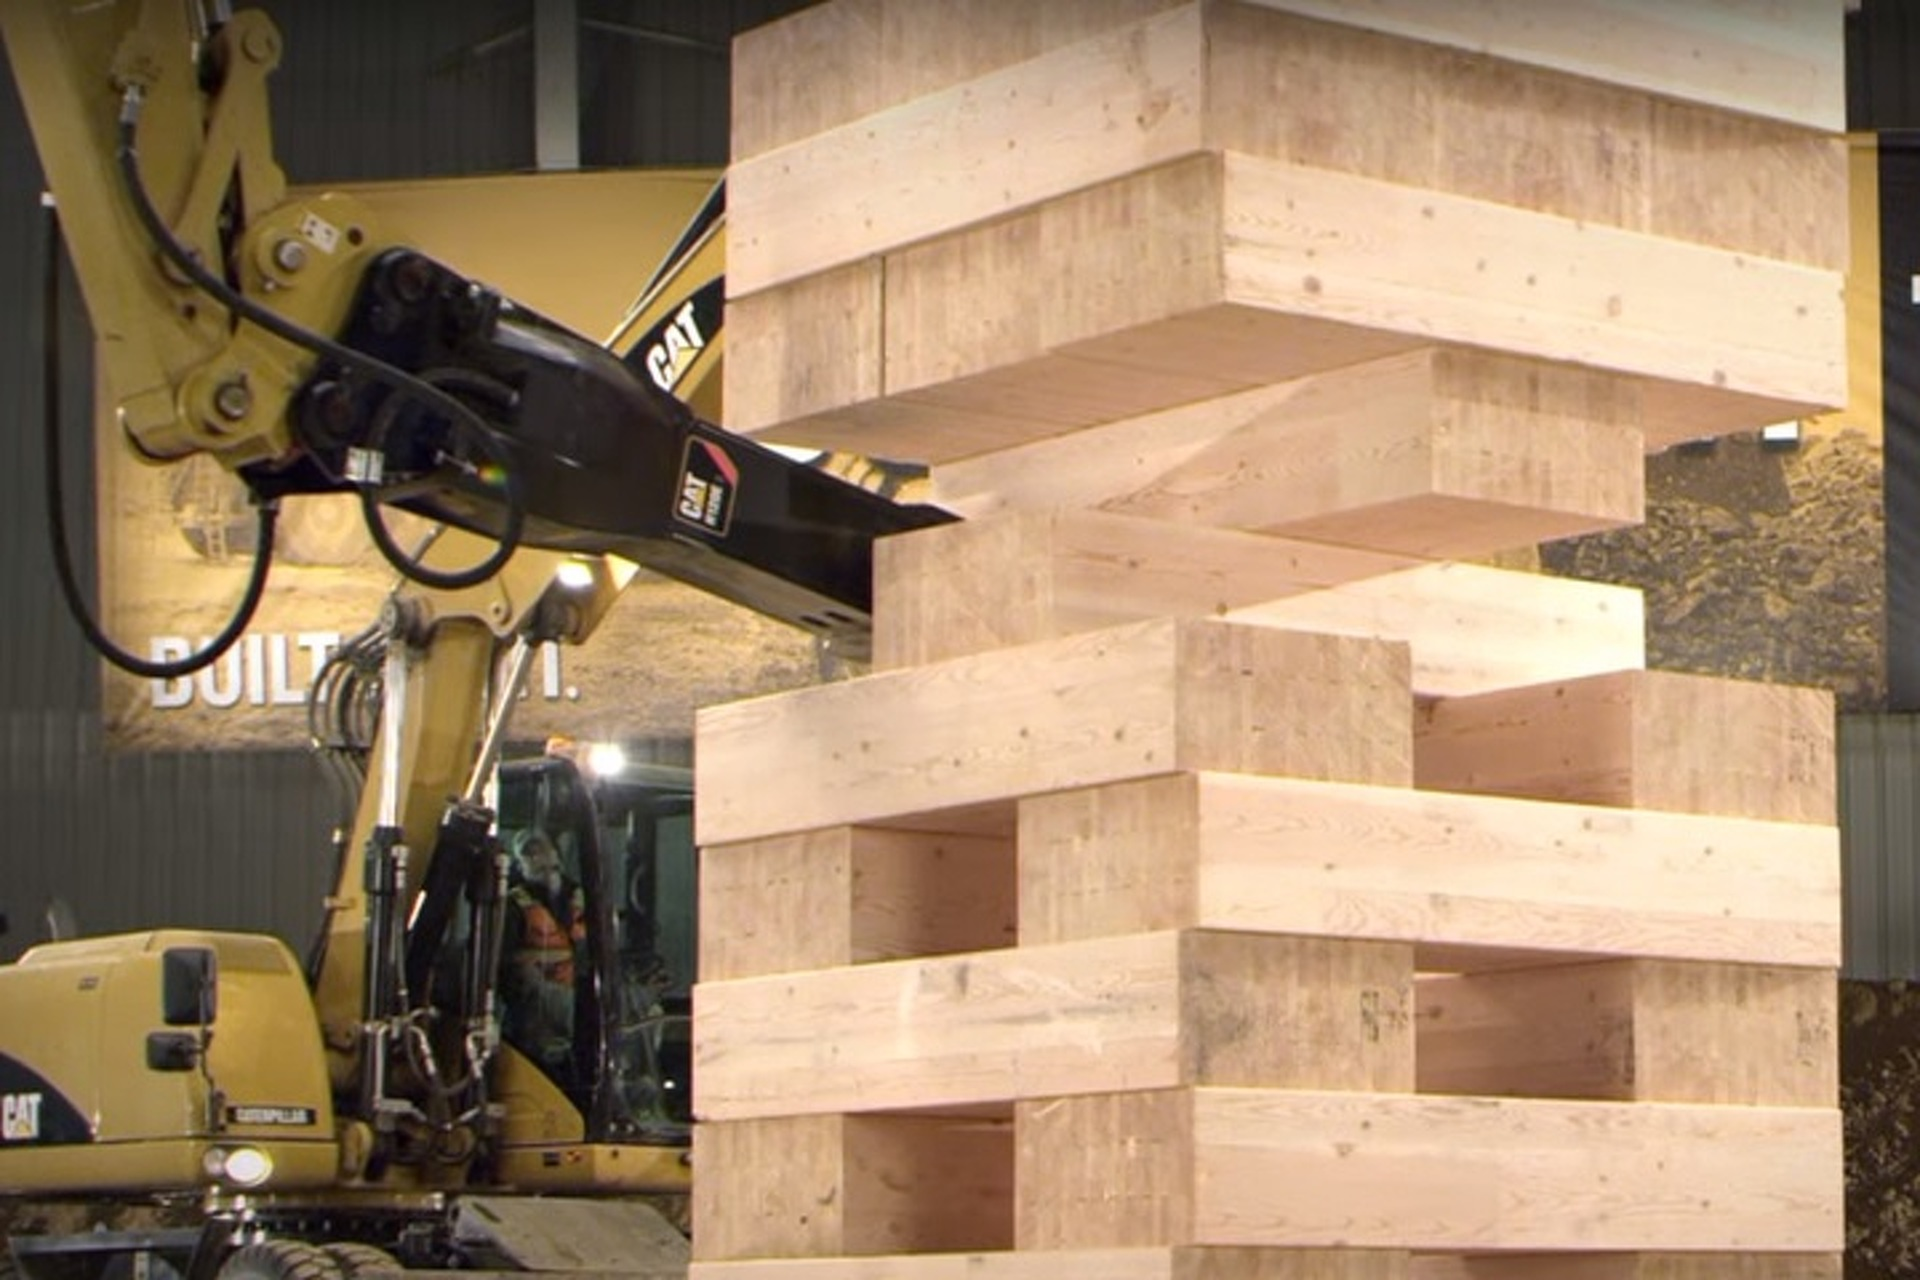 Watch a Game of Jenga Using Caterpillar Construction Vehicles